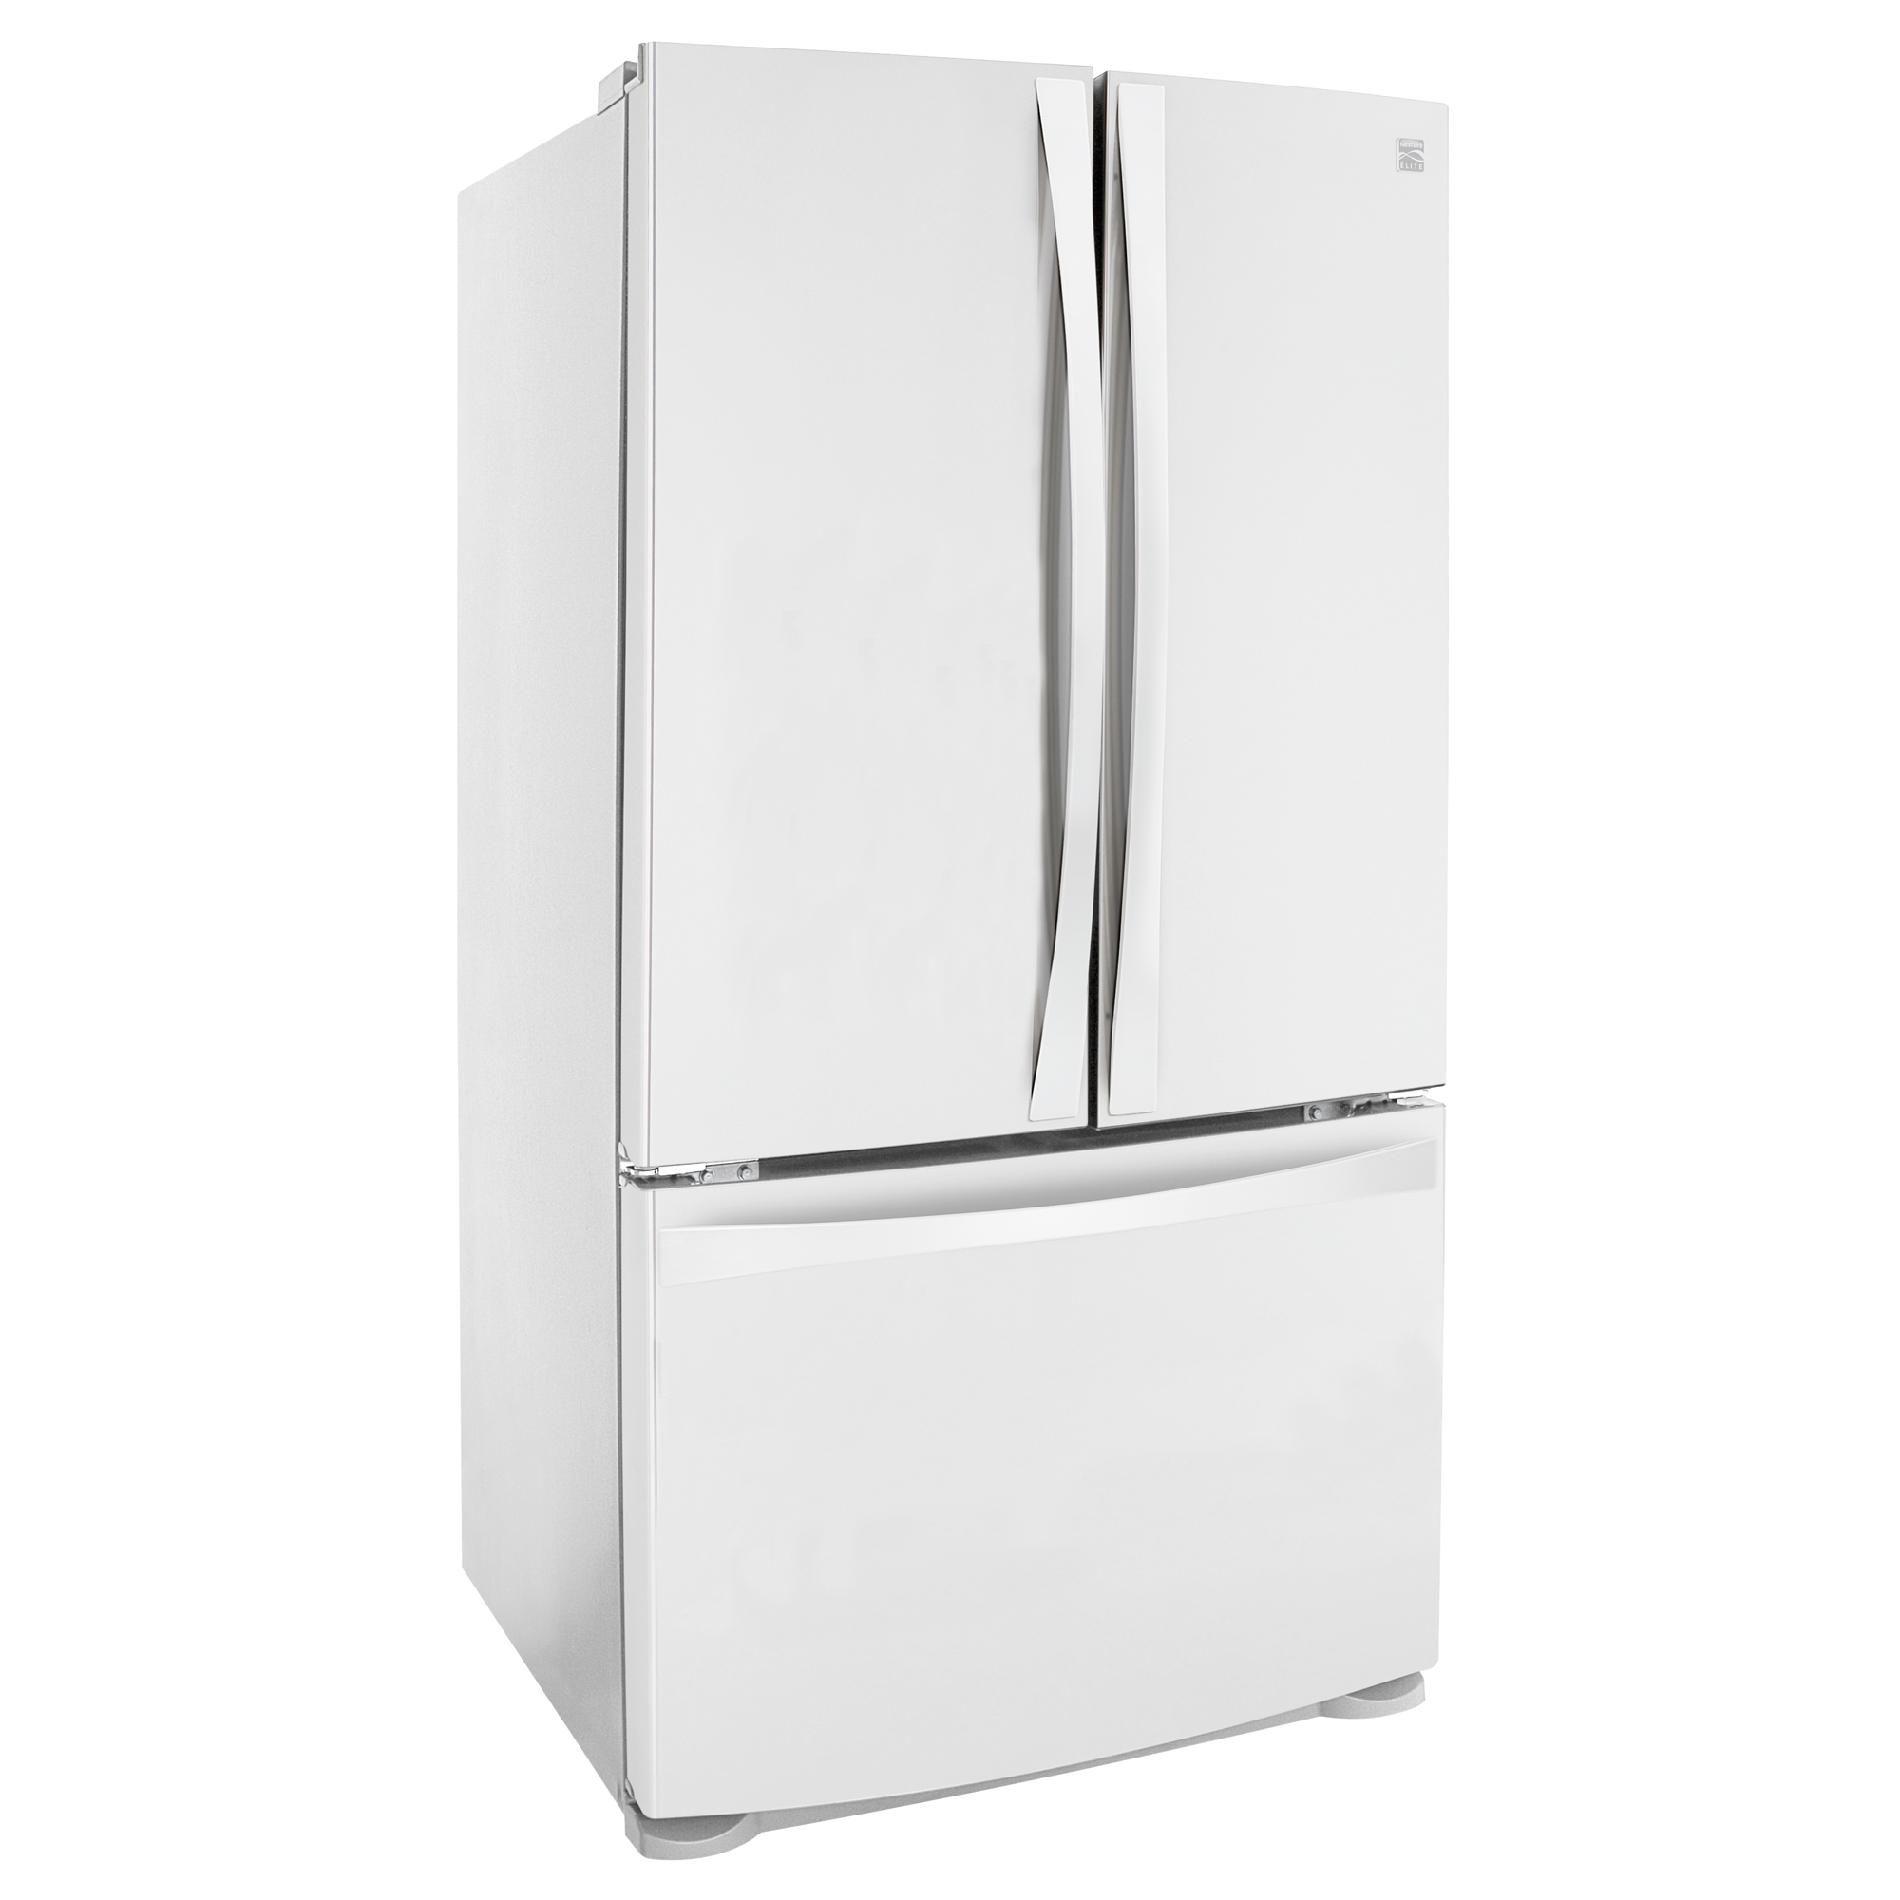 Kenmore Elite 25 cu. ft. French-Door Bottom-Freezer Refrigerator Non-Dispenser - White